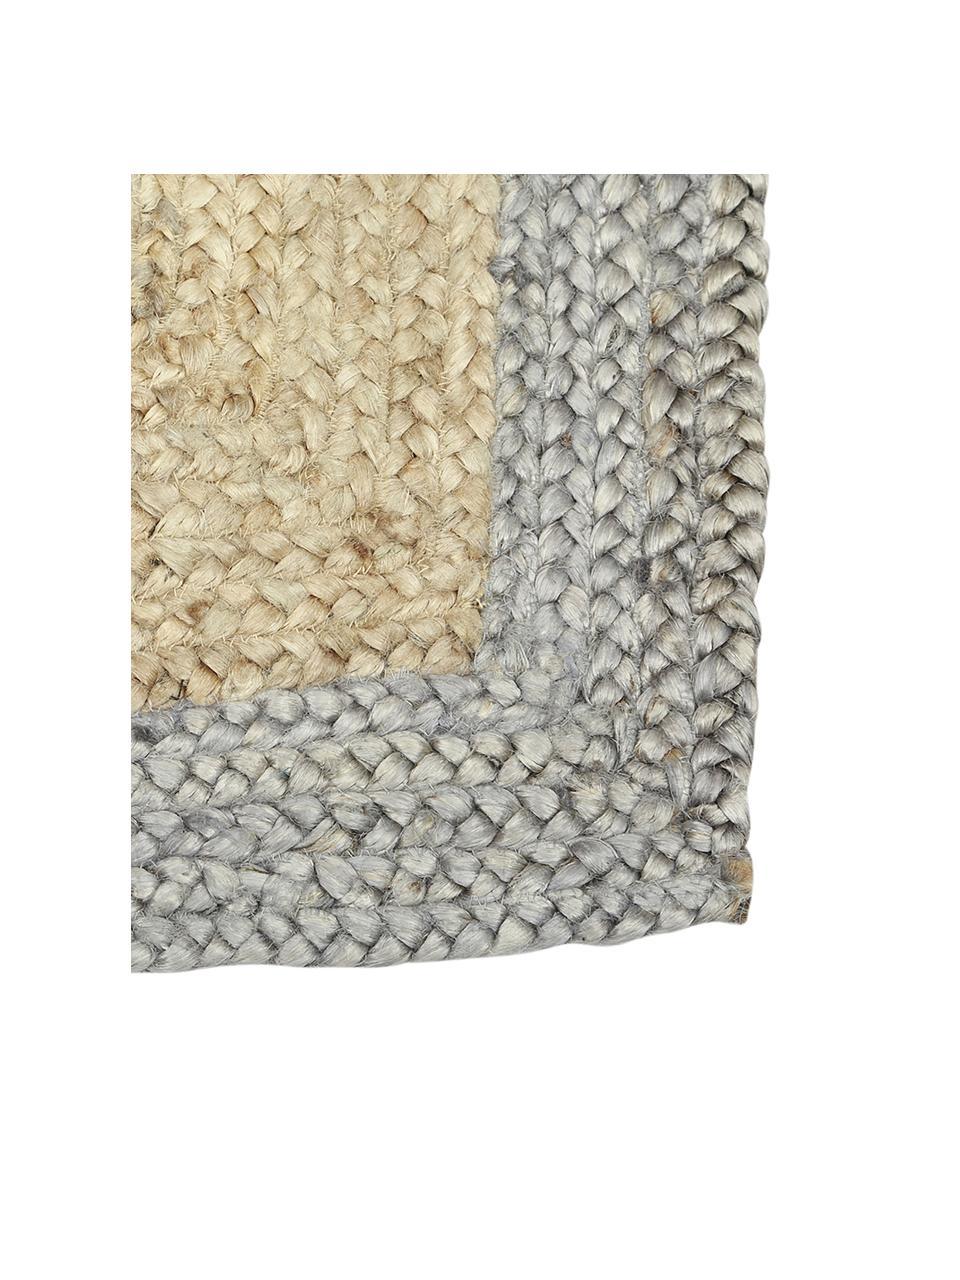 Handgefertigter Jute-Teppich Shanta mit grauem Rand, 100% Jute, Beige, Grau, B 80 x L 150 cm (Größe XS)